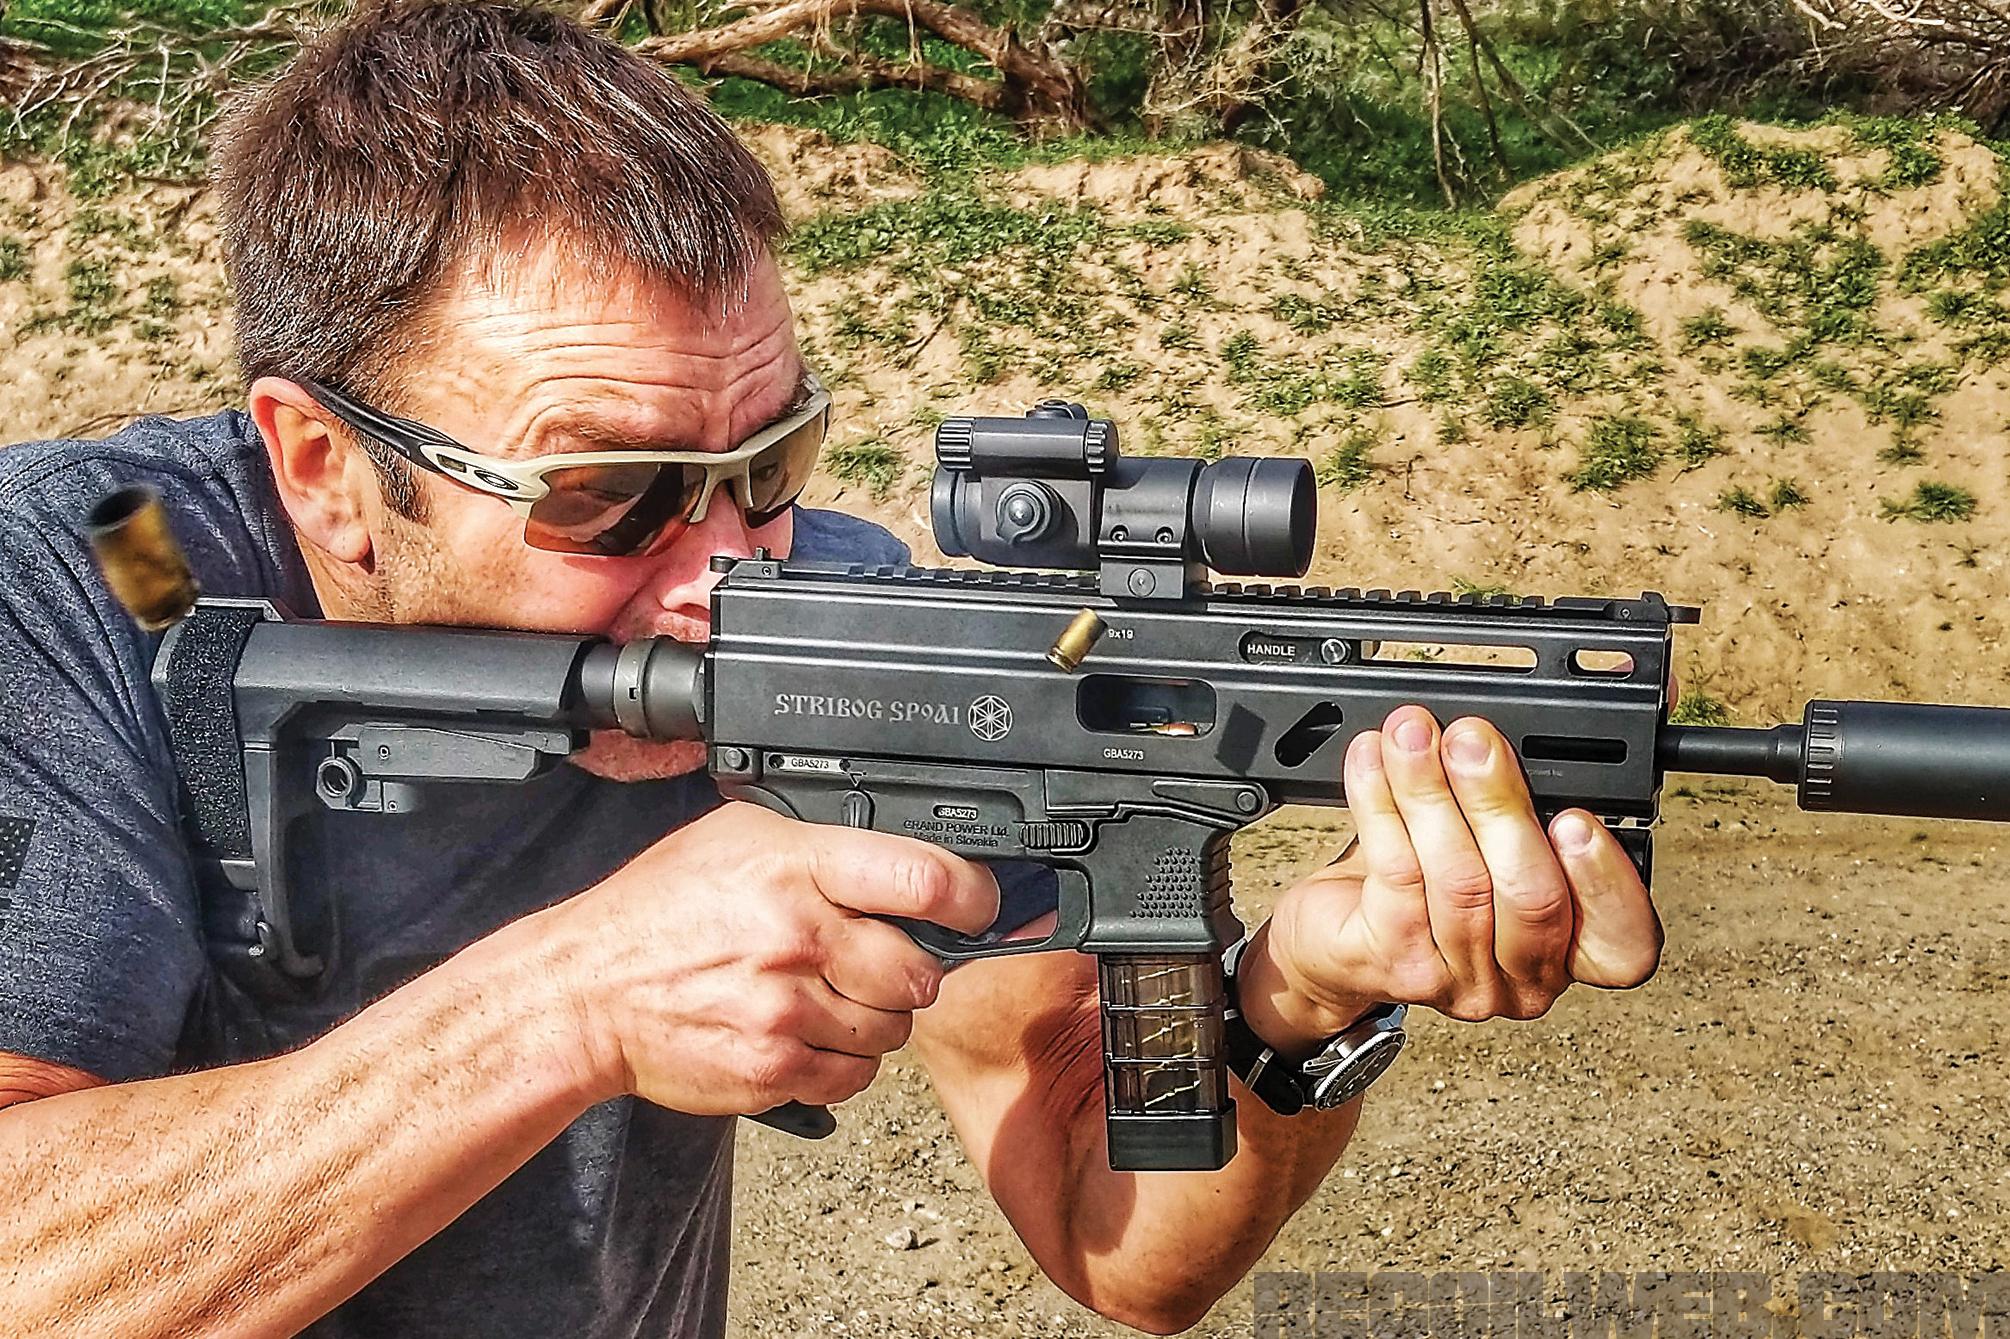 Grand Power Stribog SP9A1 9mm 8 20rd Black